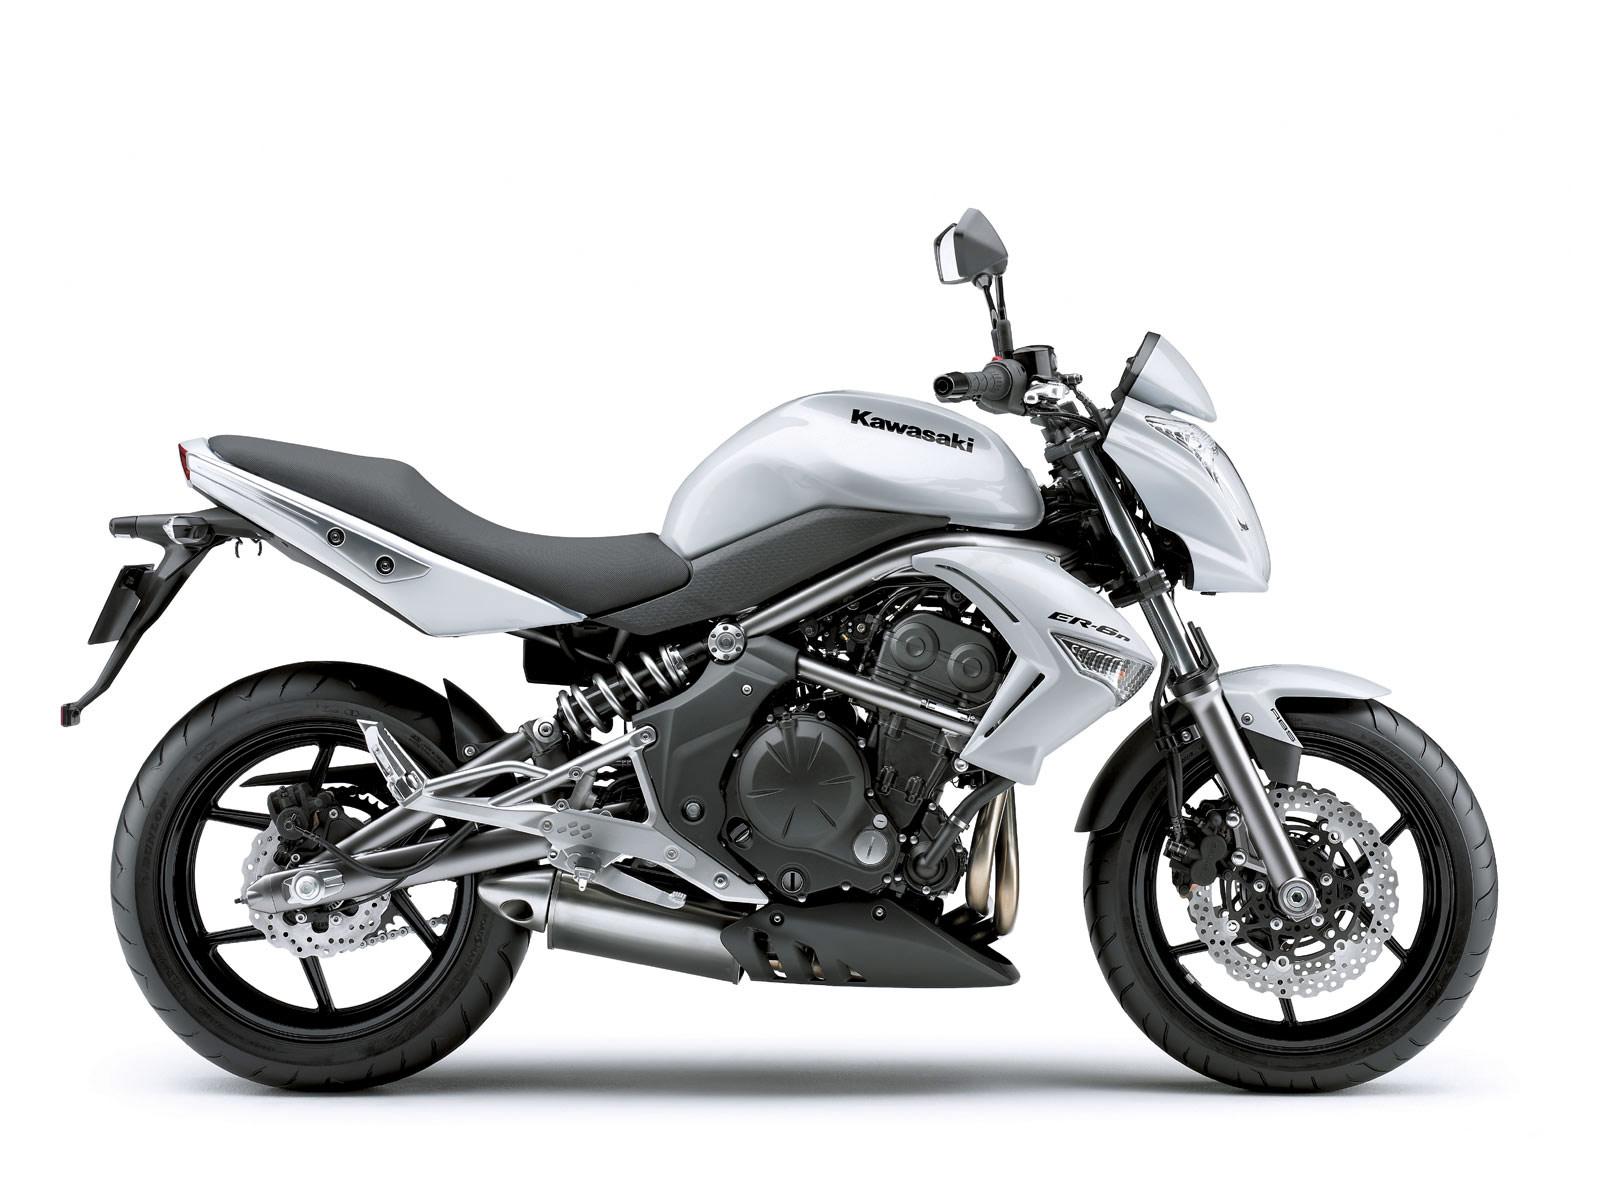 Modifikasi Motor Kawasaki Ninja Cc Modifikasi Sepeda Motor